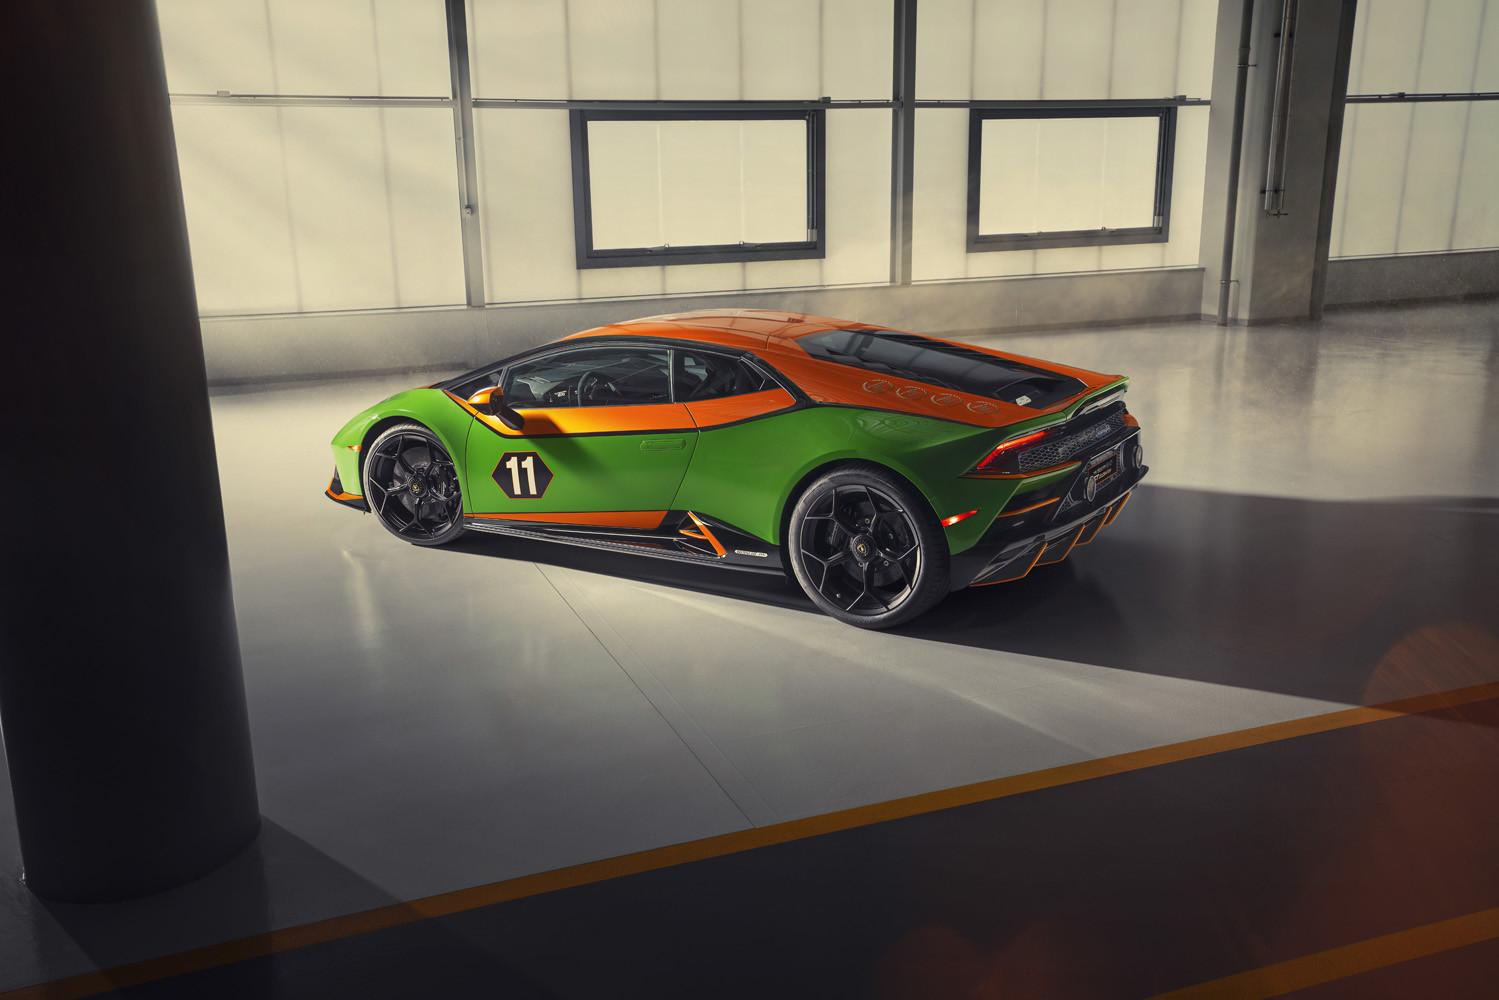 Foto de Lamborghini Aventador SVJ 63 Roadster y Huracán EVO GT Celebration (25/26)